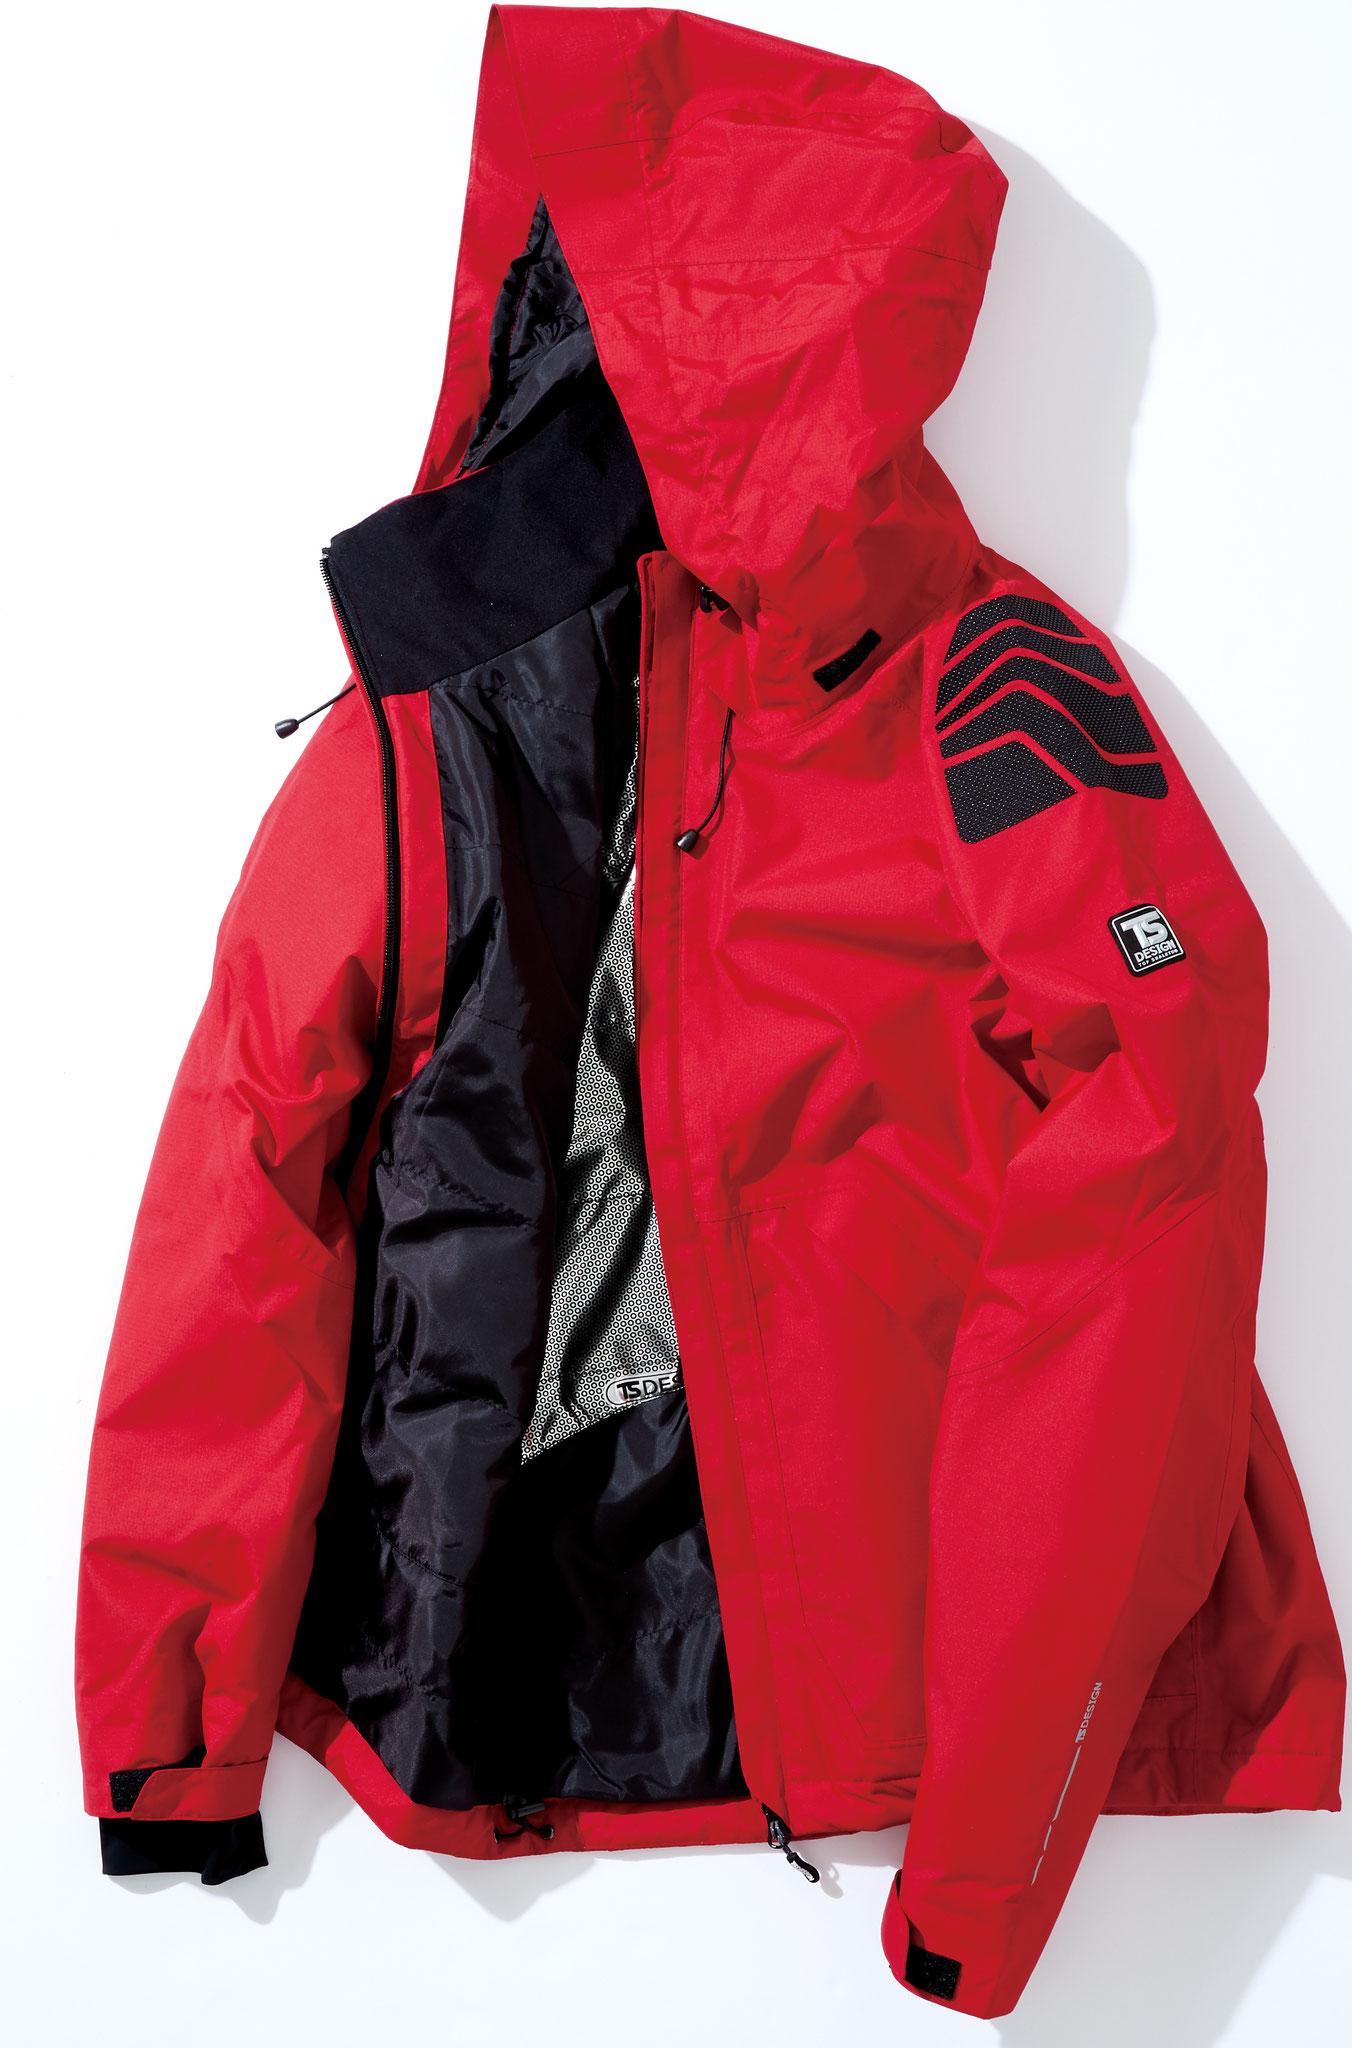 TS DESIGN(TSデザイン)18226 メガヒート防水防寒ジャケット ¥12,650(税込)